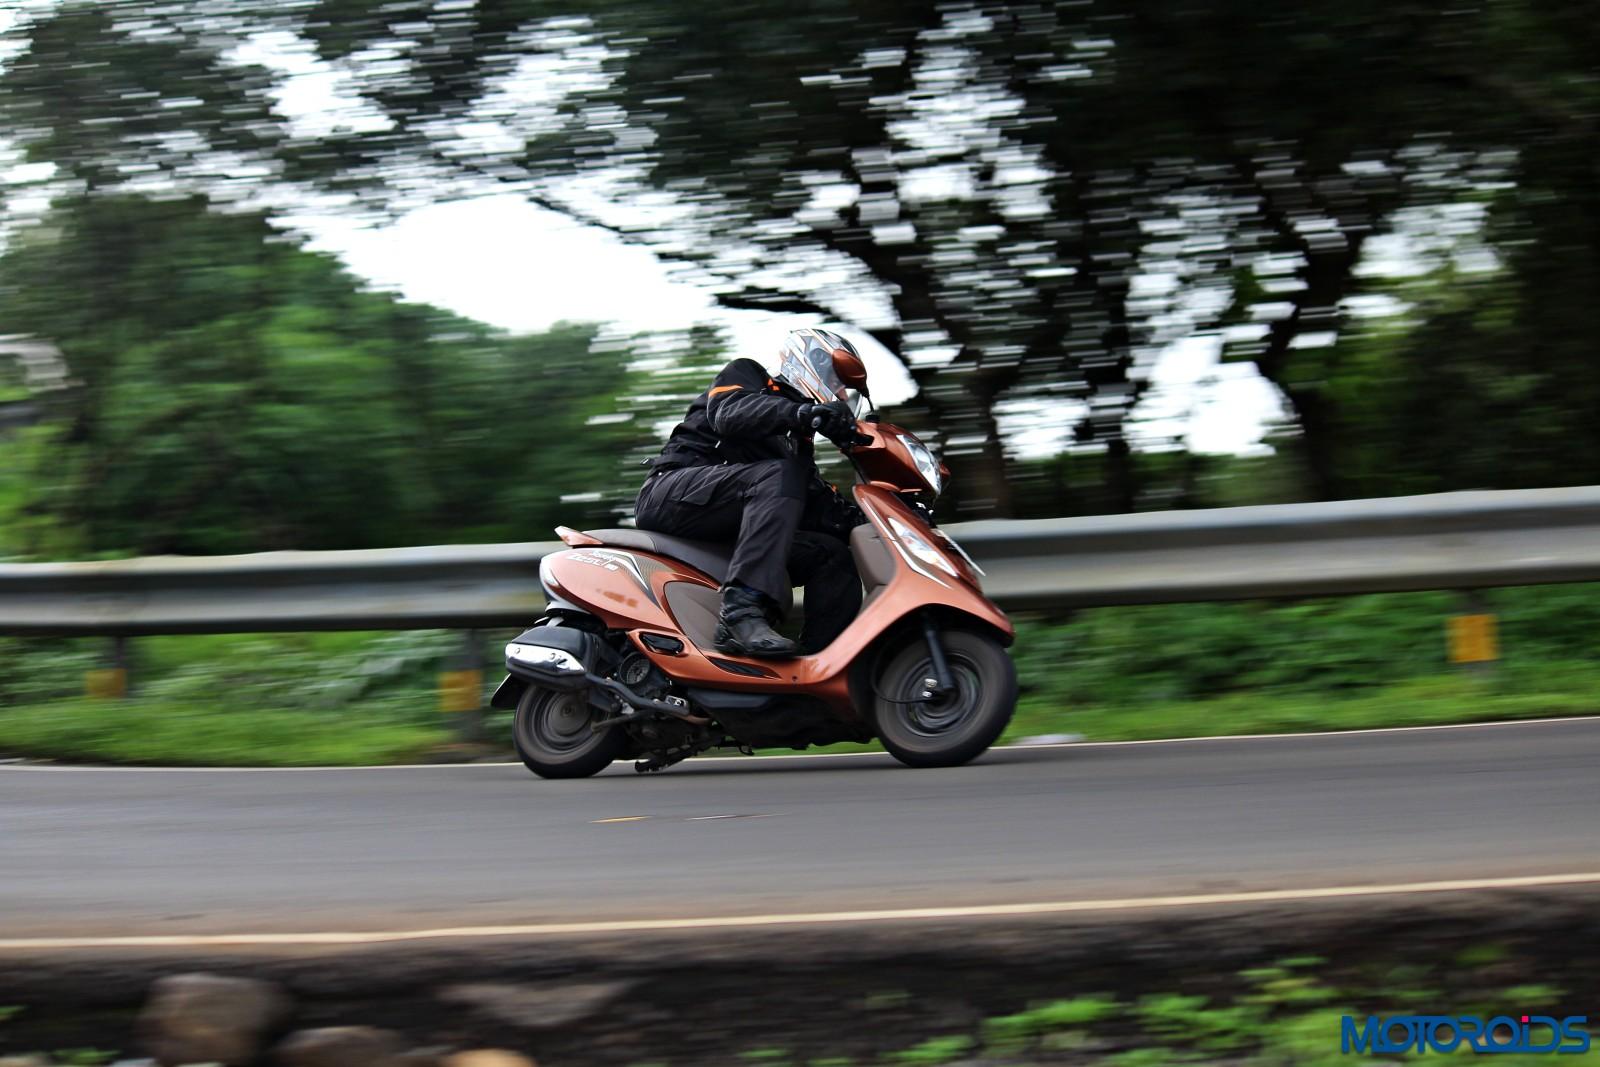 tvs-scooty-zest-how-to-buy-riding-gear-4